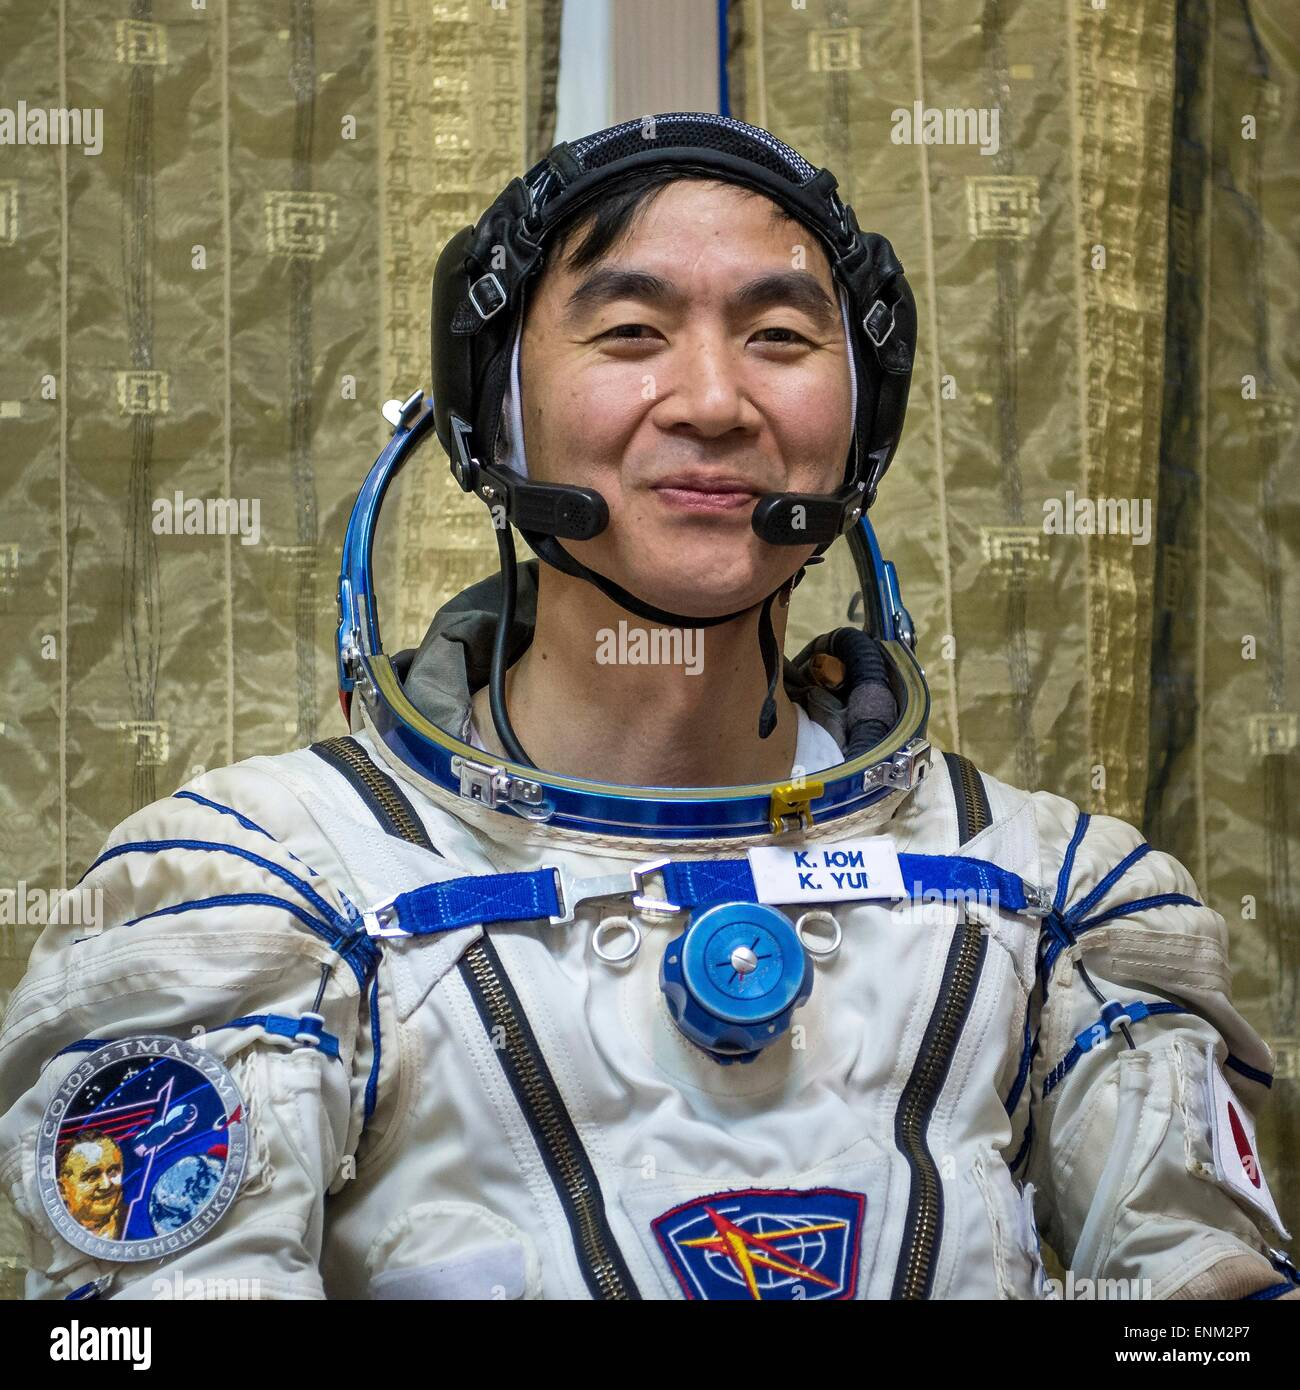 International Space Station Expedition 44 crew member astronaut Kimiya Yui of the Japan Aerospace Exploration Agency - Stock Image